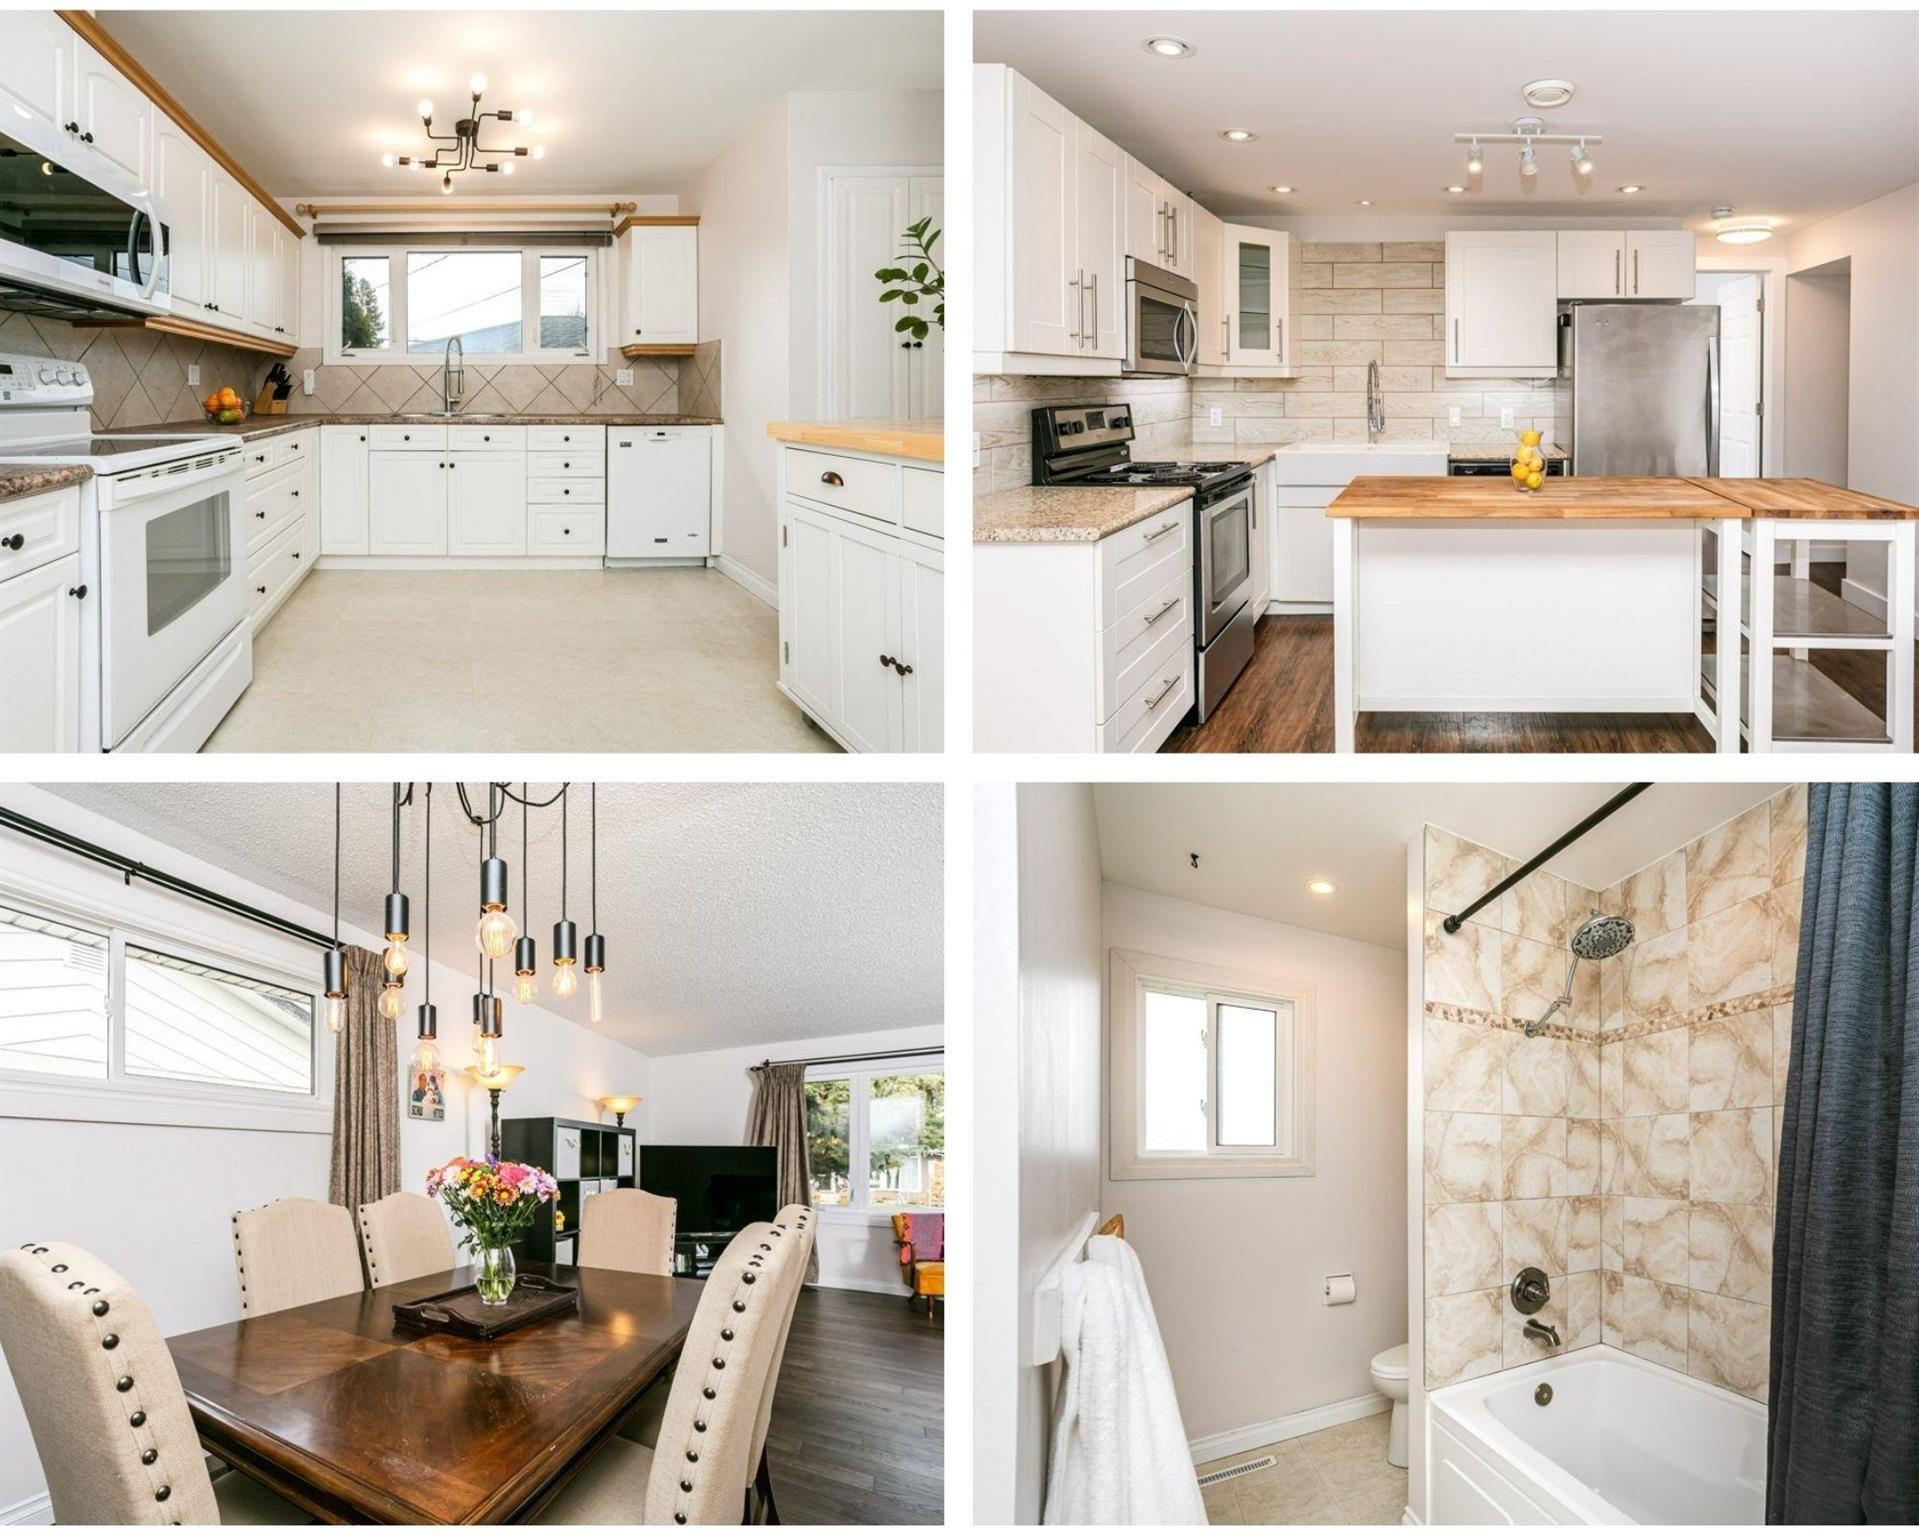 Main Photo: 8911 157 Street in Edmonton: Zone 22 House for sale : MLS®# E4246342